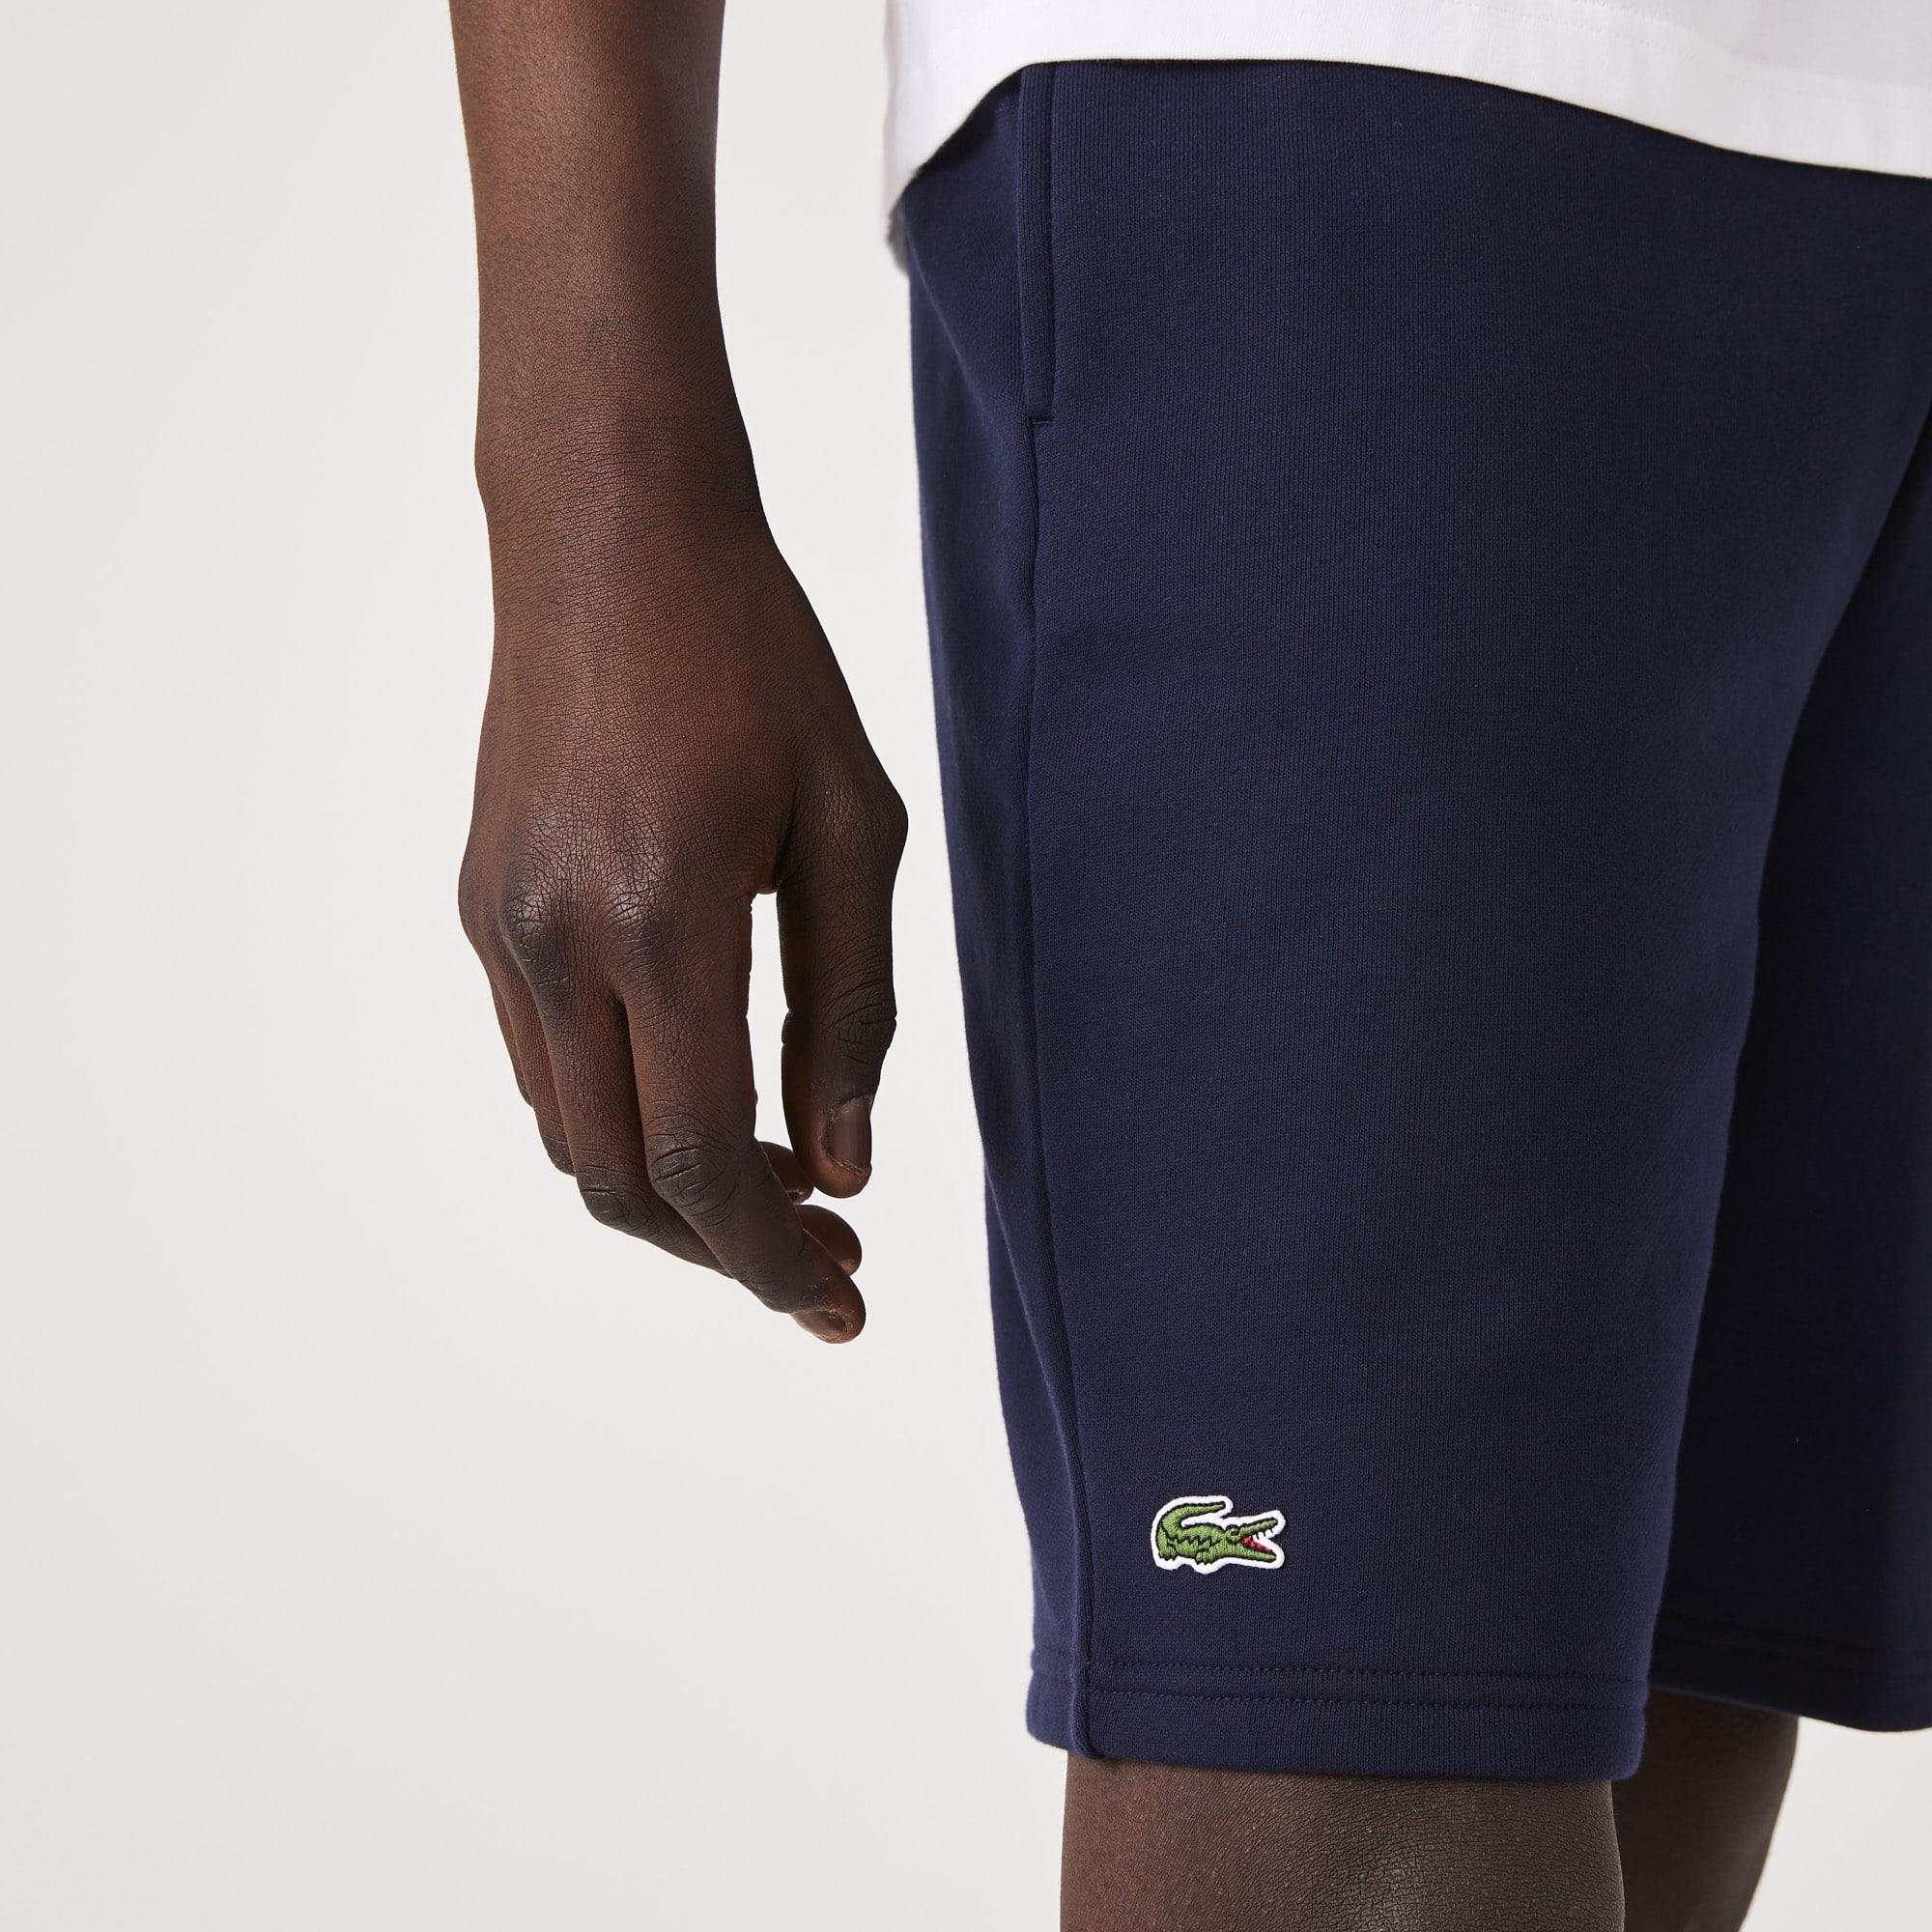 1aeff720afe Herren-Shorts aus Fleece LACOSTE SPORT TENNIS | LACOSTE